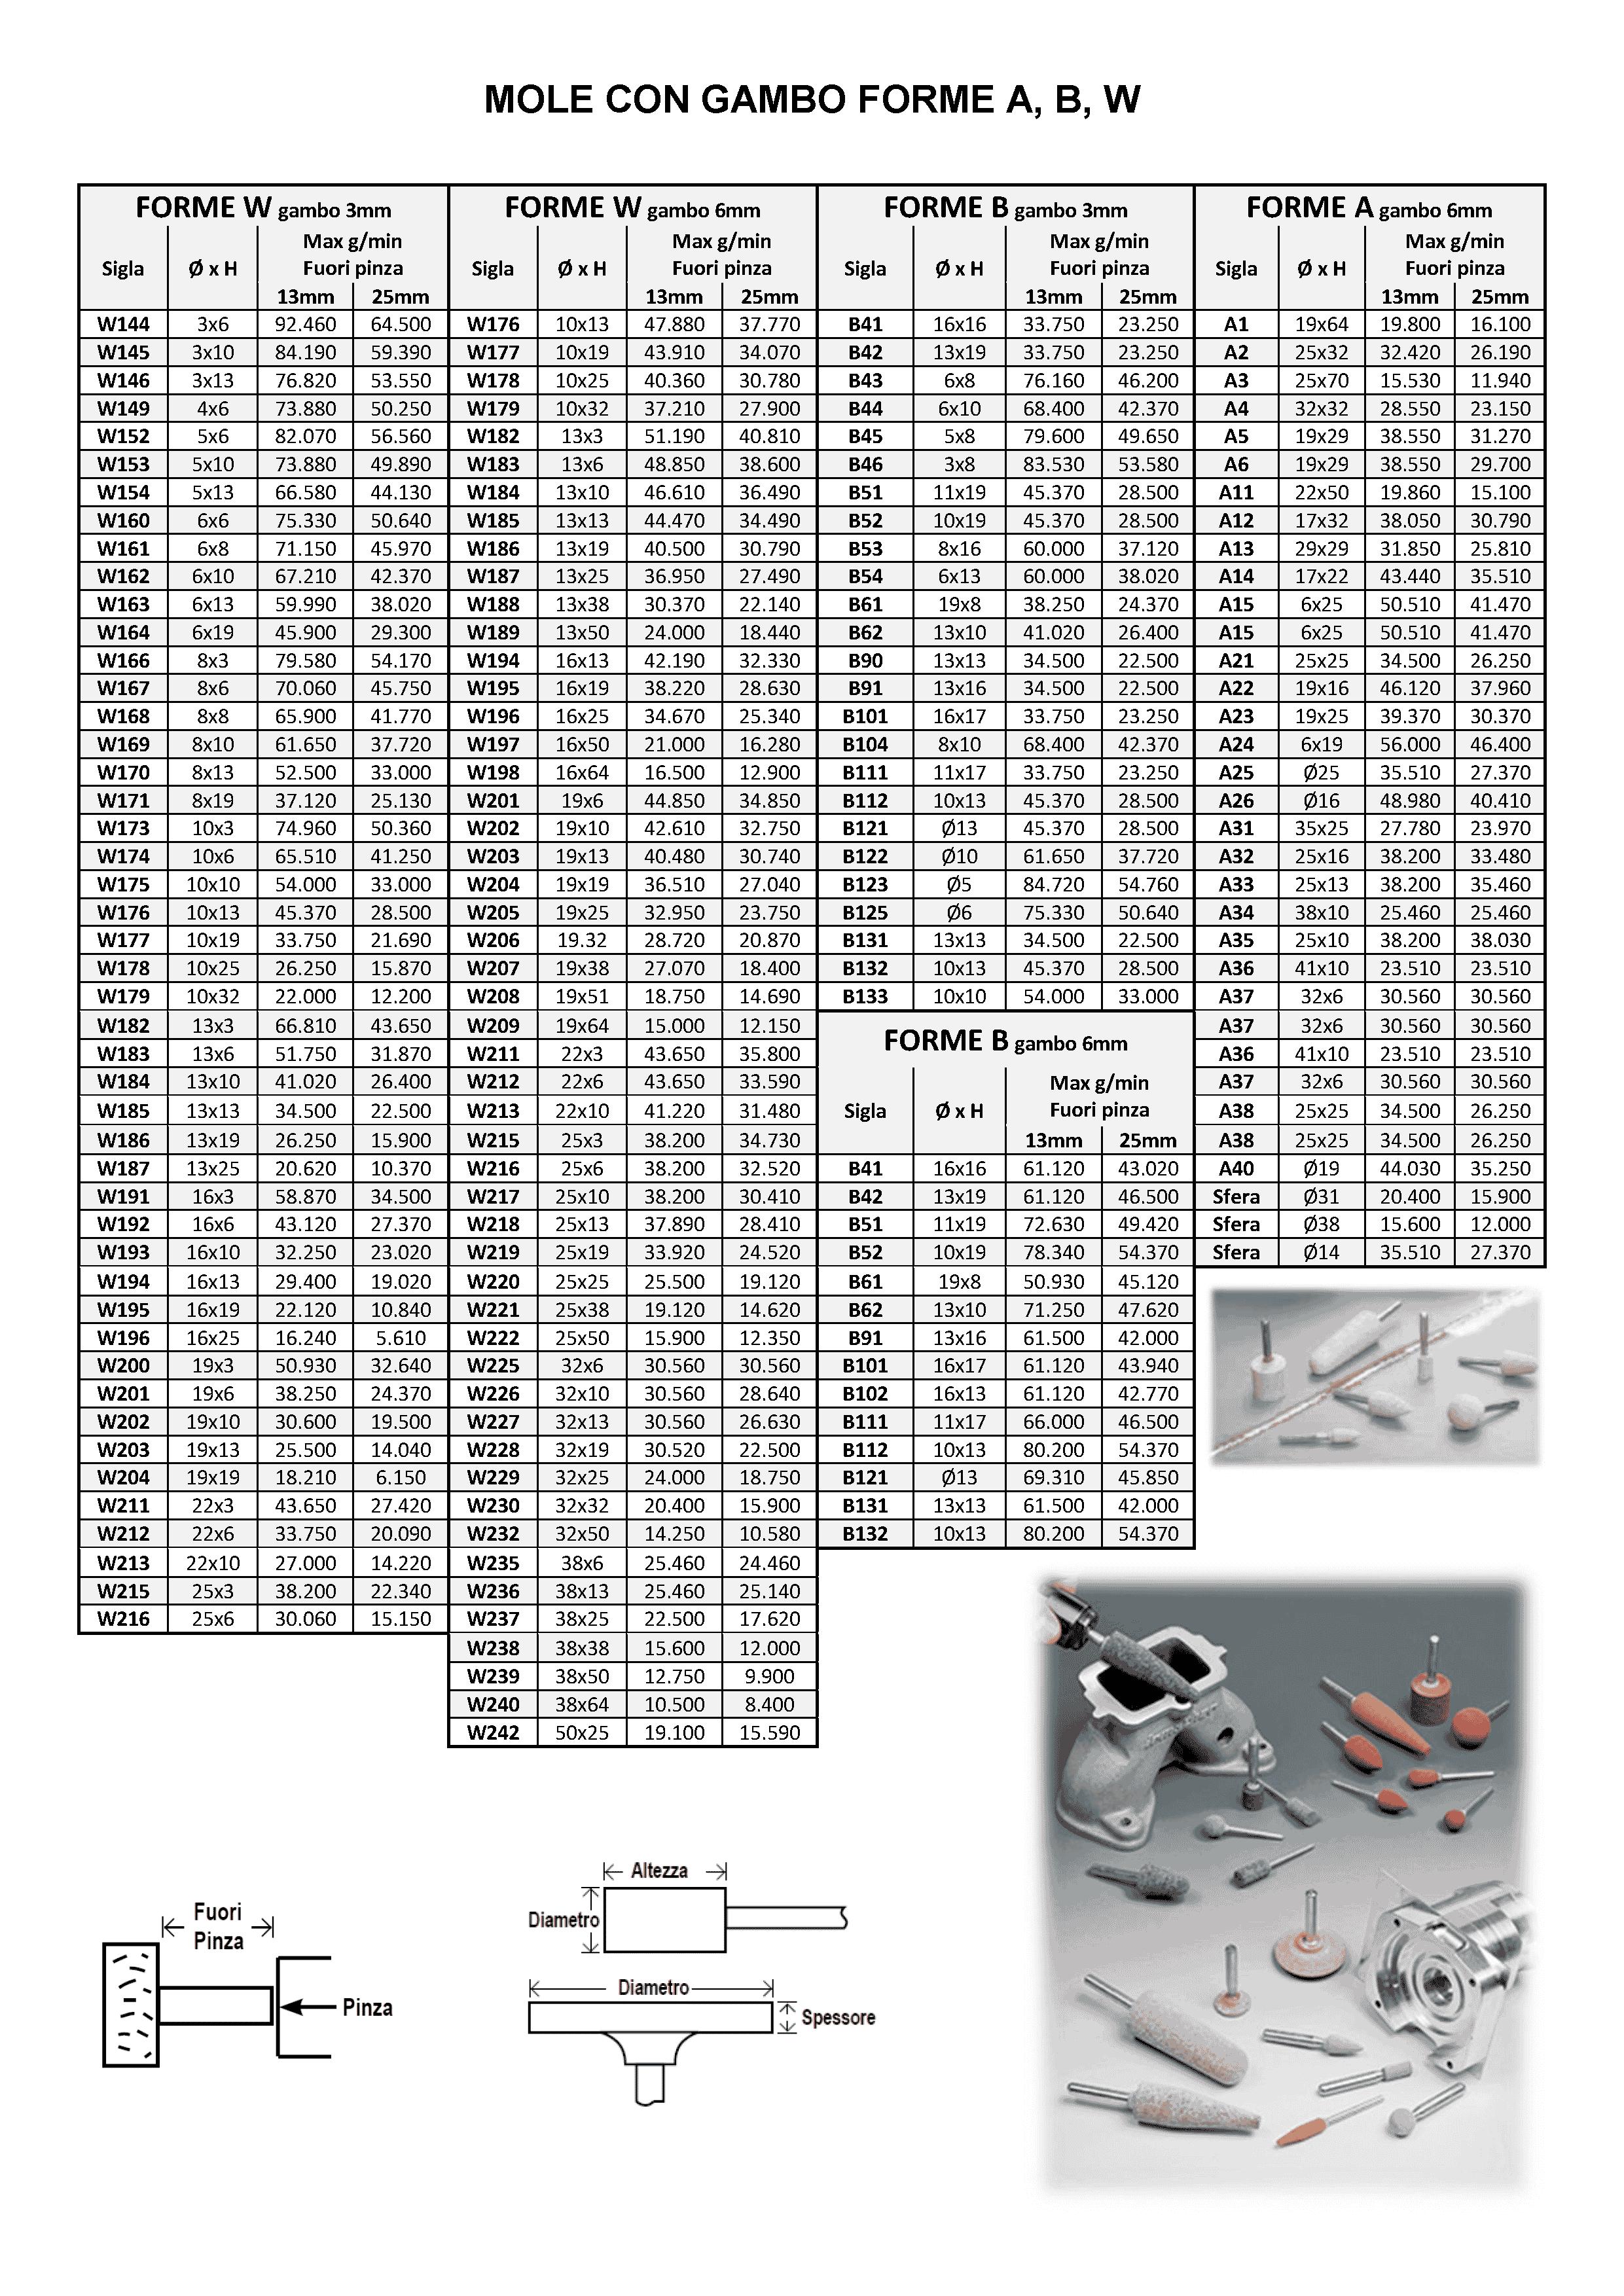 rex-cut-abrasivi-fibra-cotone-abrasivo-mole-con-gambo-a-b-w-05